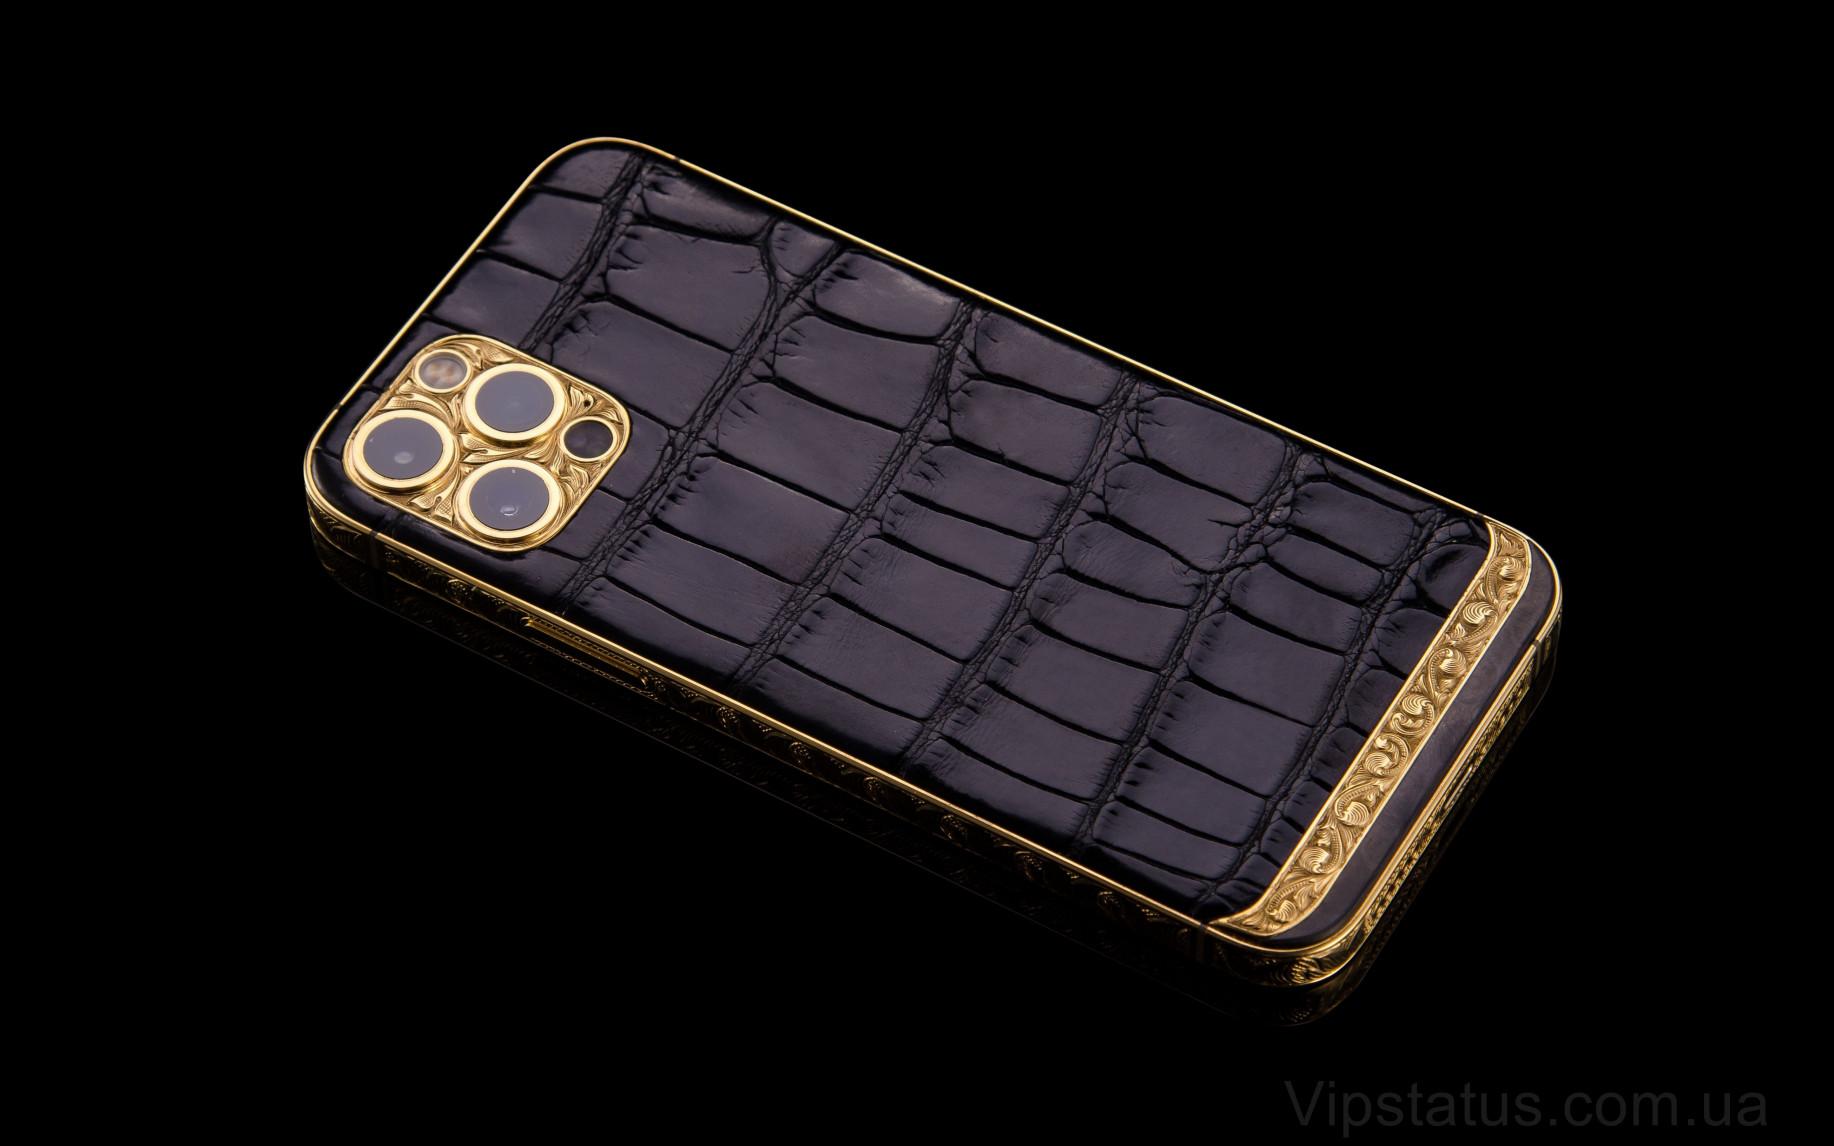 Elite Gold Edition IPHONE 12 PRO MAX 512 GB Gold Edition IPHONE 12 PRO MAX 512 GB image 2